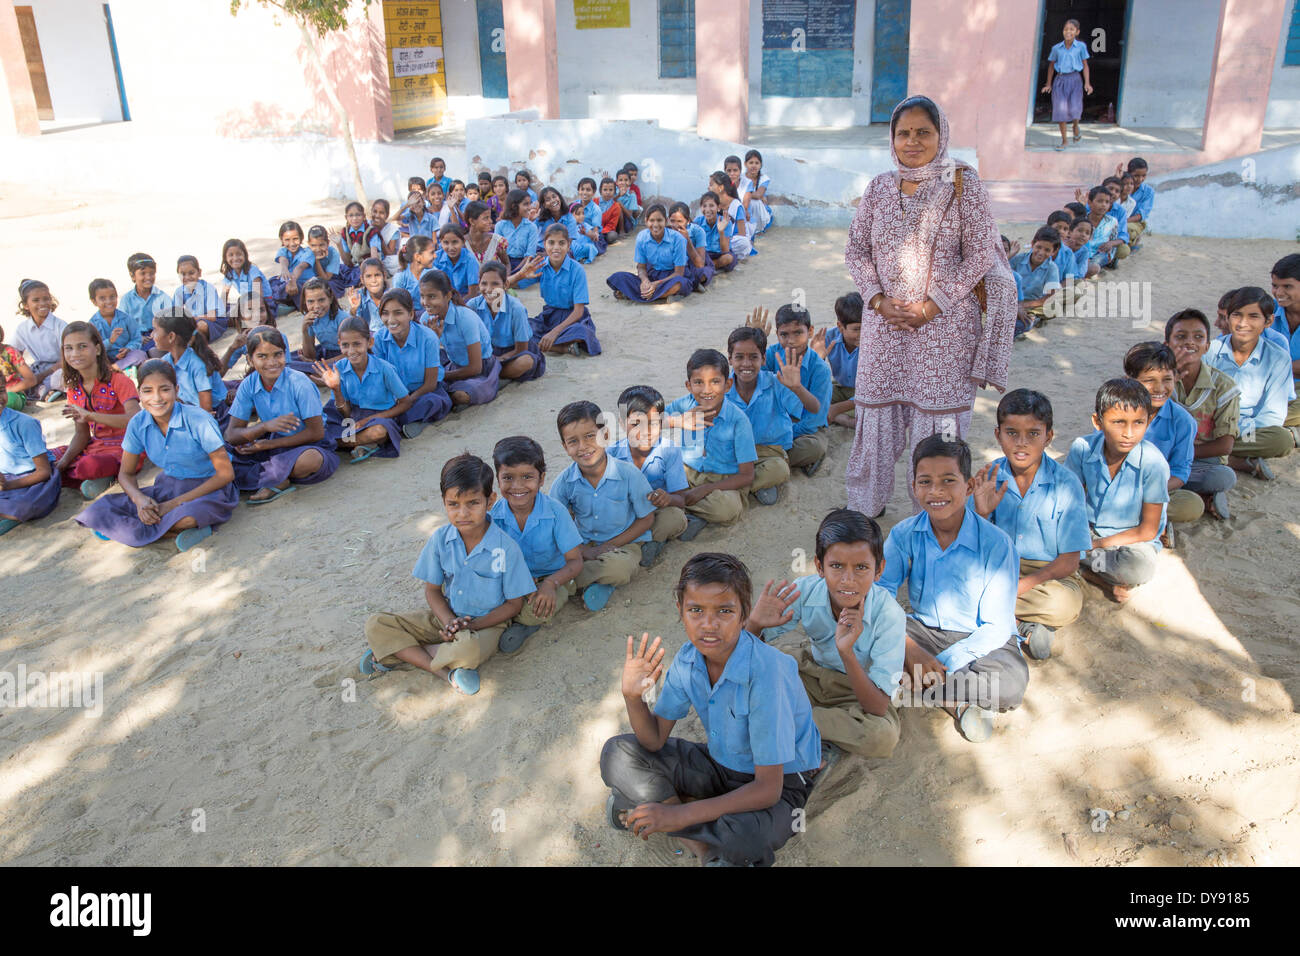 Indian, school, Asia, India, children, sit, Rajasthan, - Stock Image